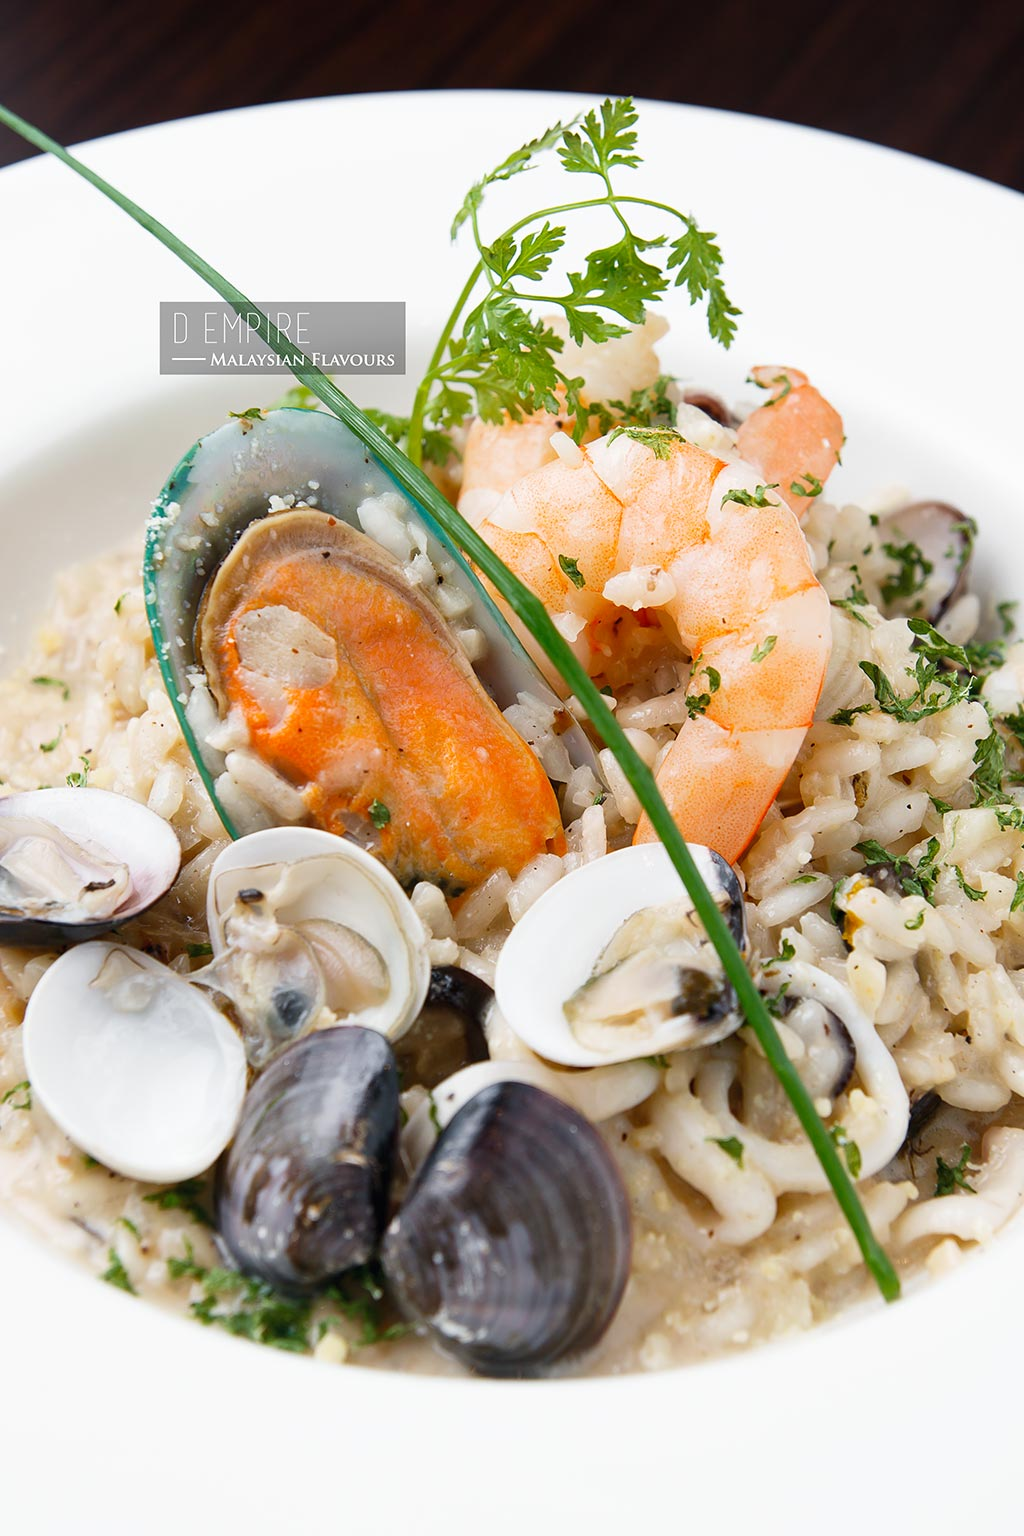 D Empire European Cuisine seafood risotto